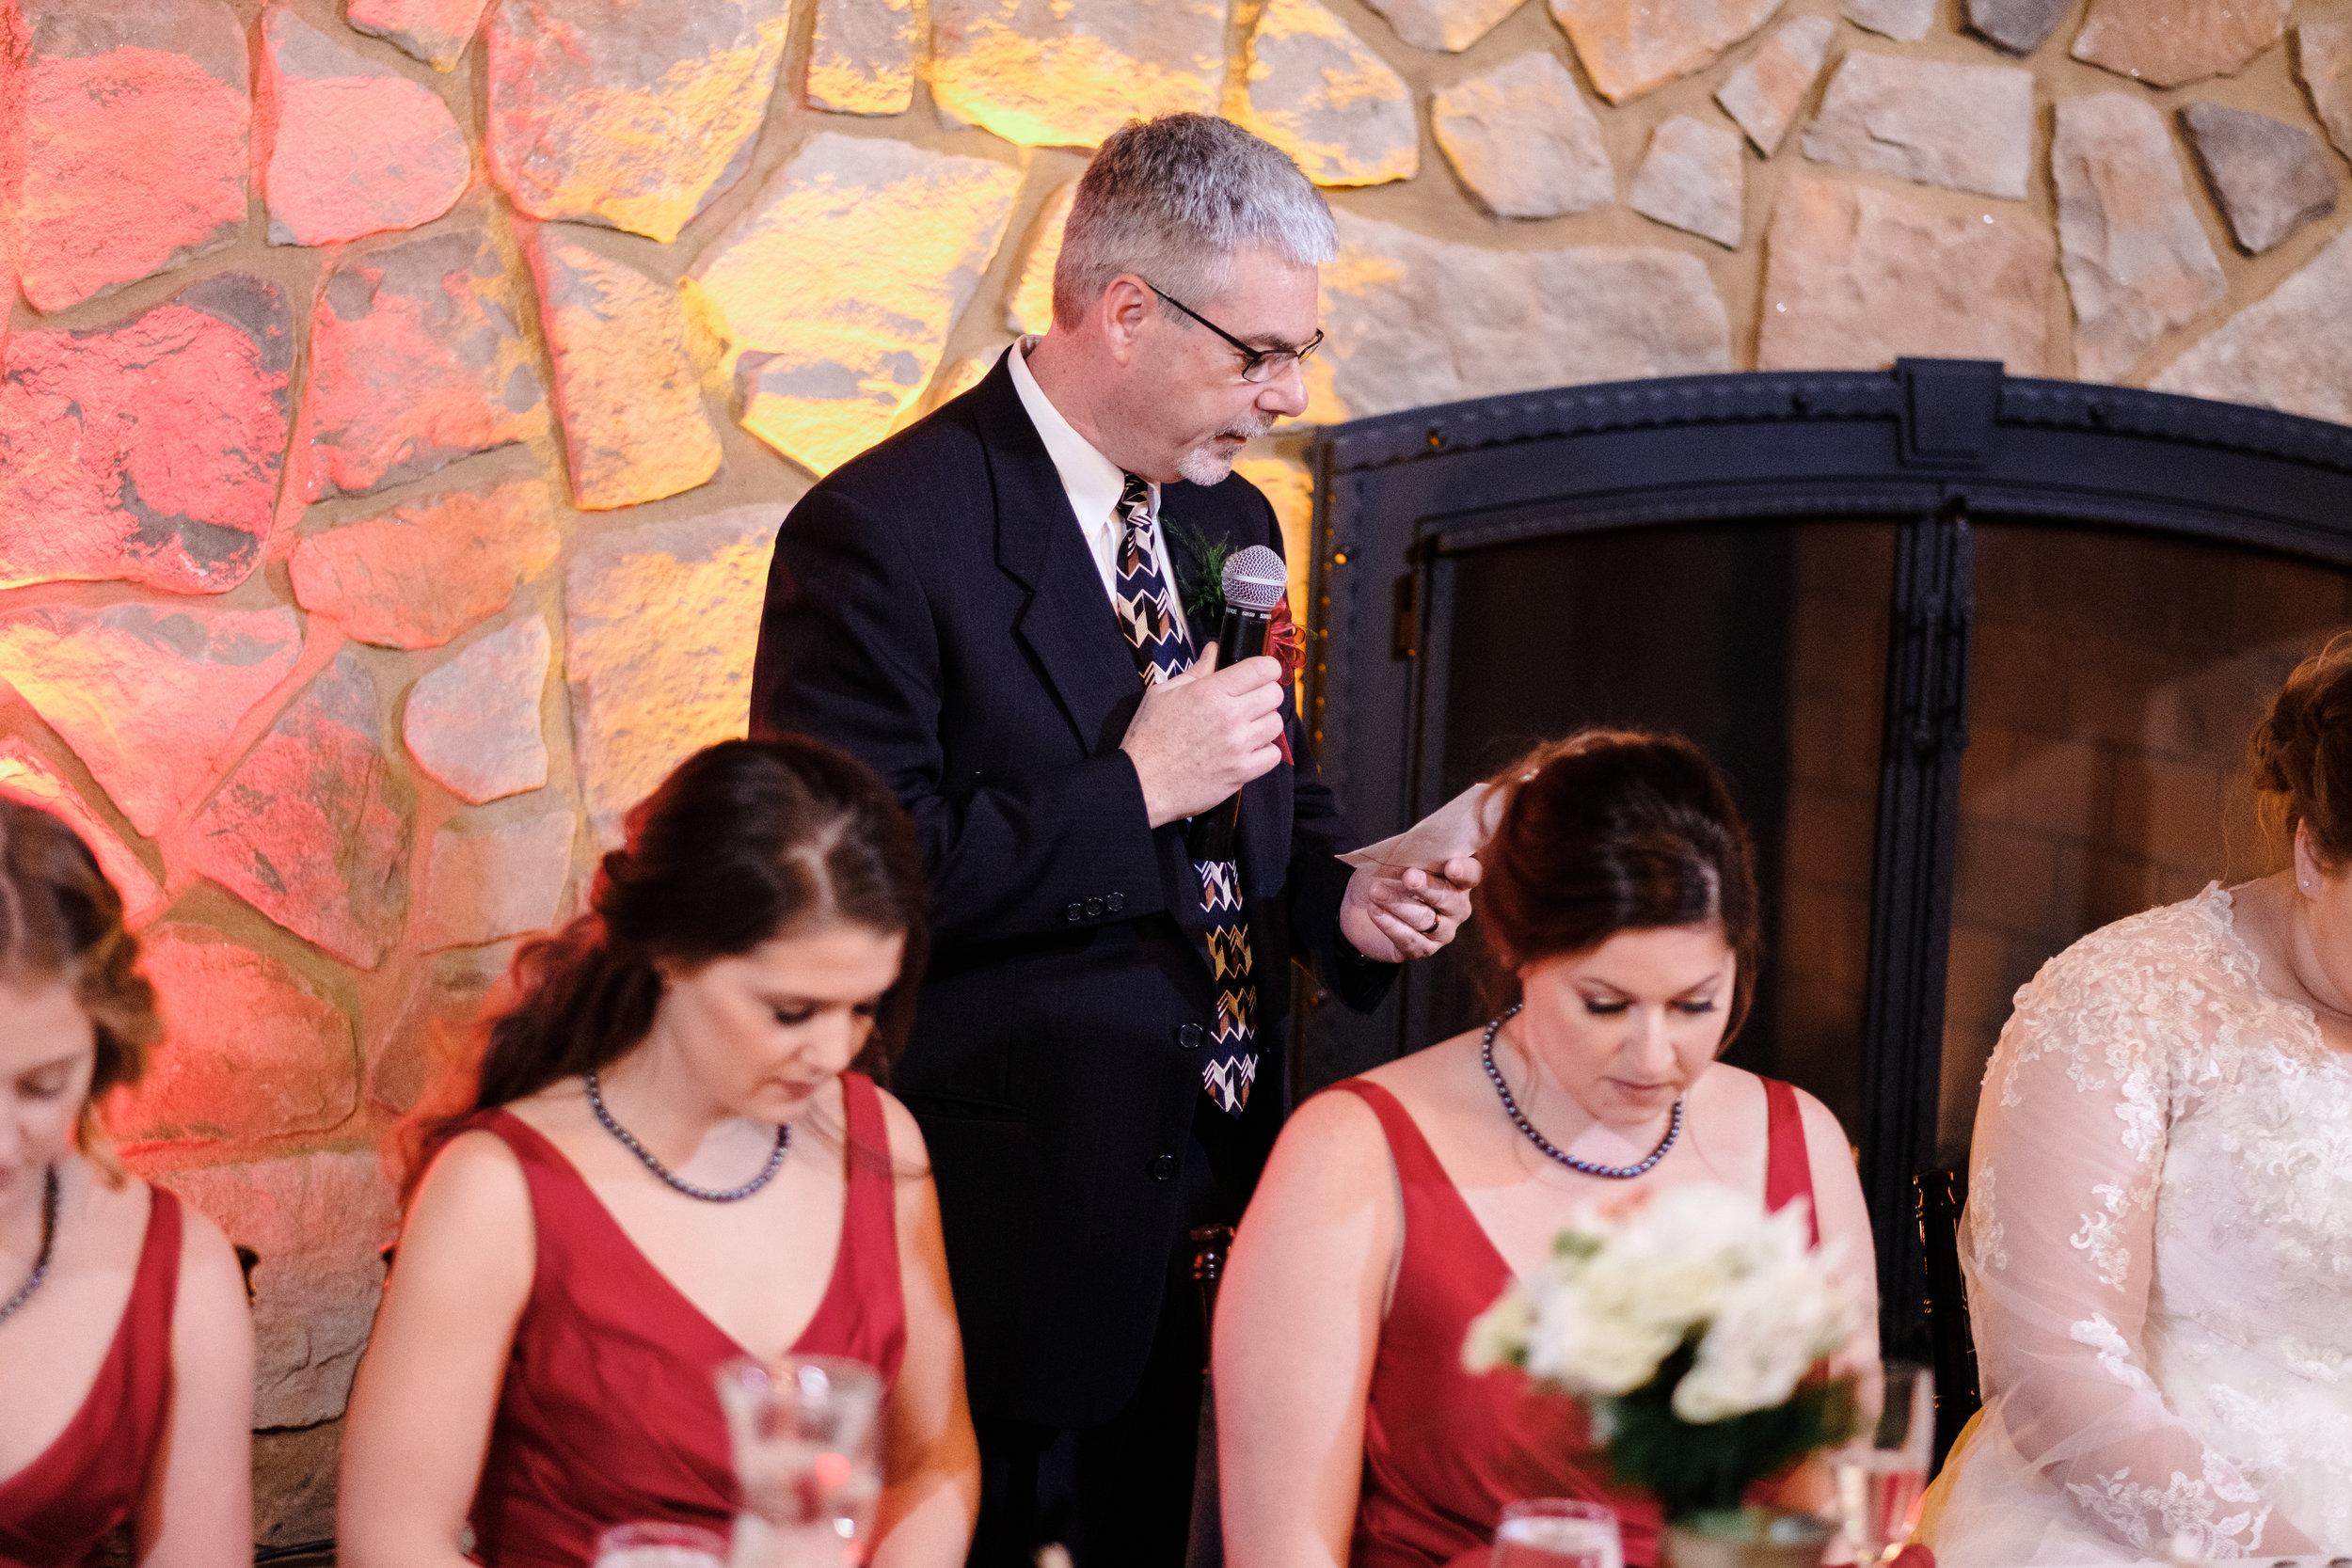 18-12-28 Corinne-Henry-Pavilion-Wedding-463.jpg